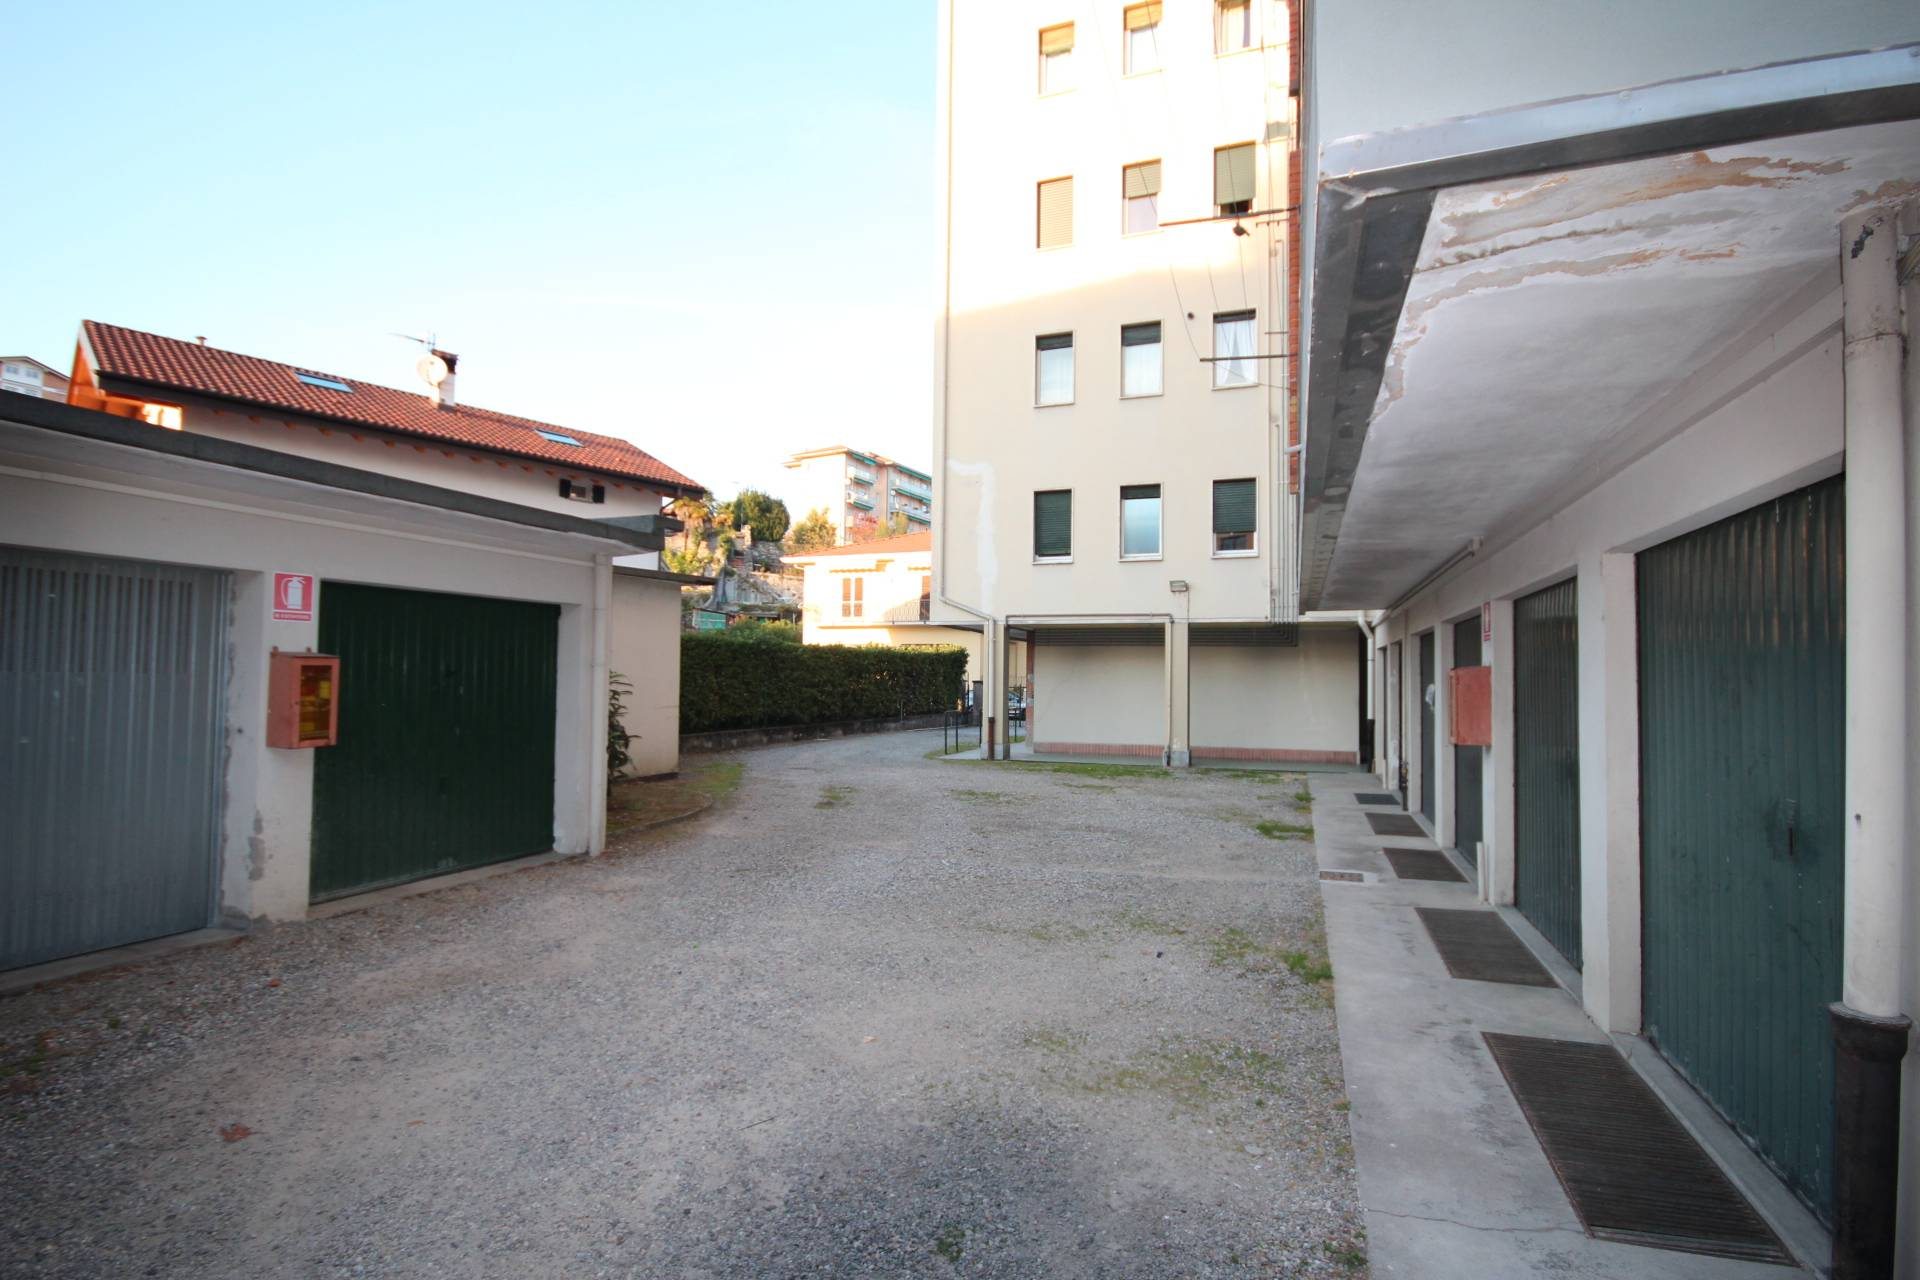 Vendita Magazzino Commerciale/Industriale Verbania 116537